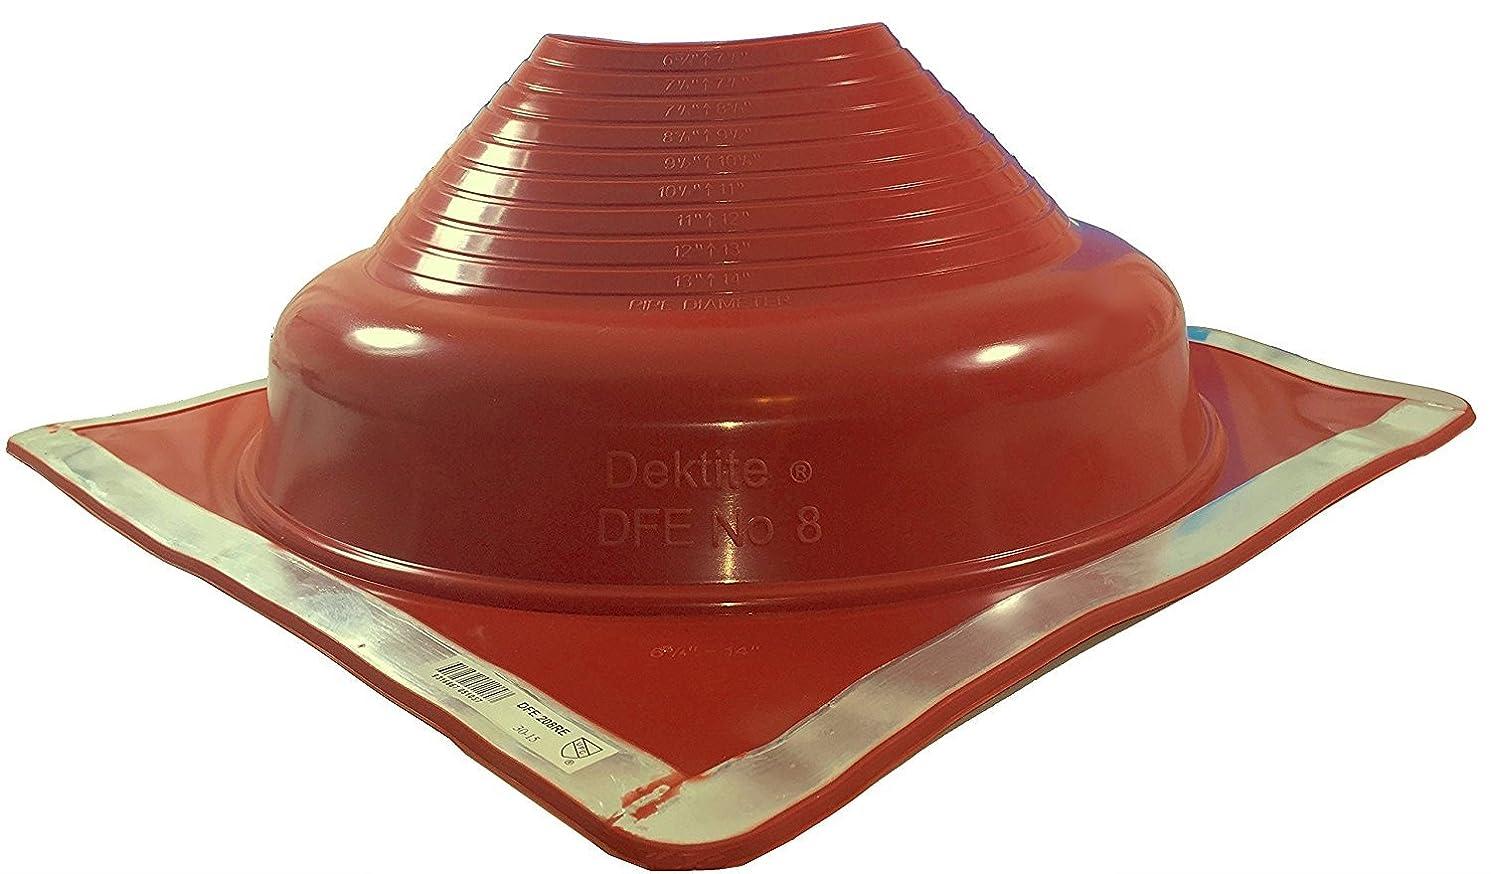 Dektite Premium #8 Red Silicone Metal Roof Pipe Flashing, High Temp, Square Base, Pipe OD 6-3/4